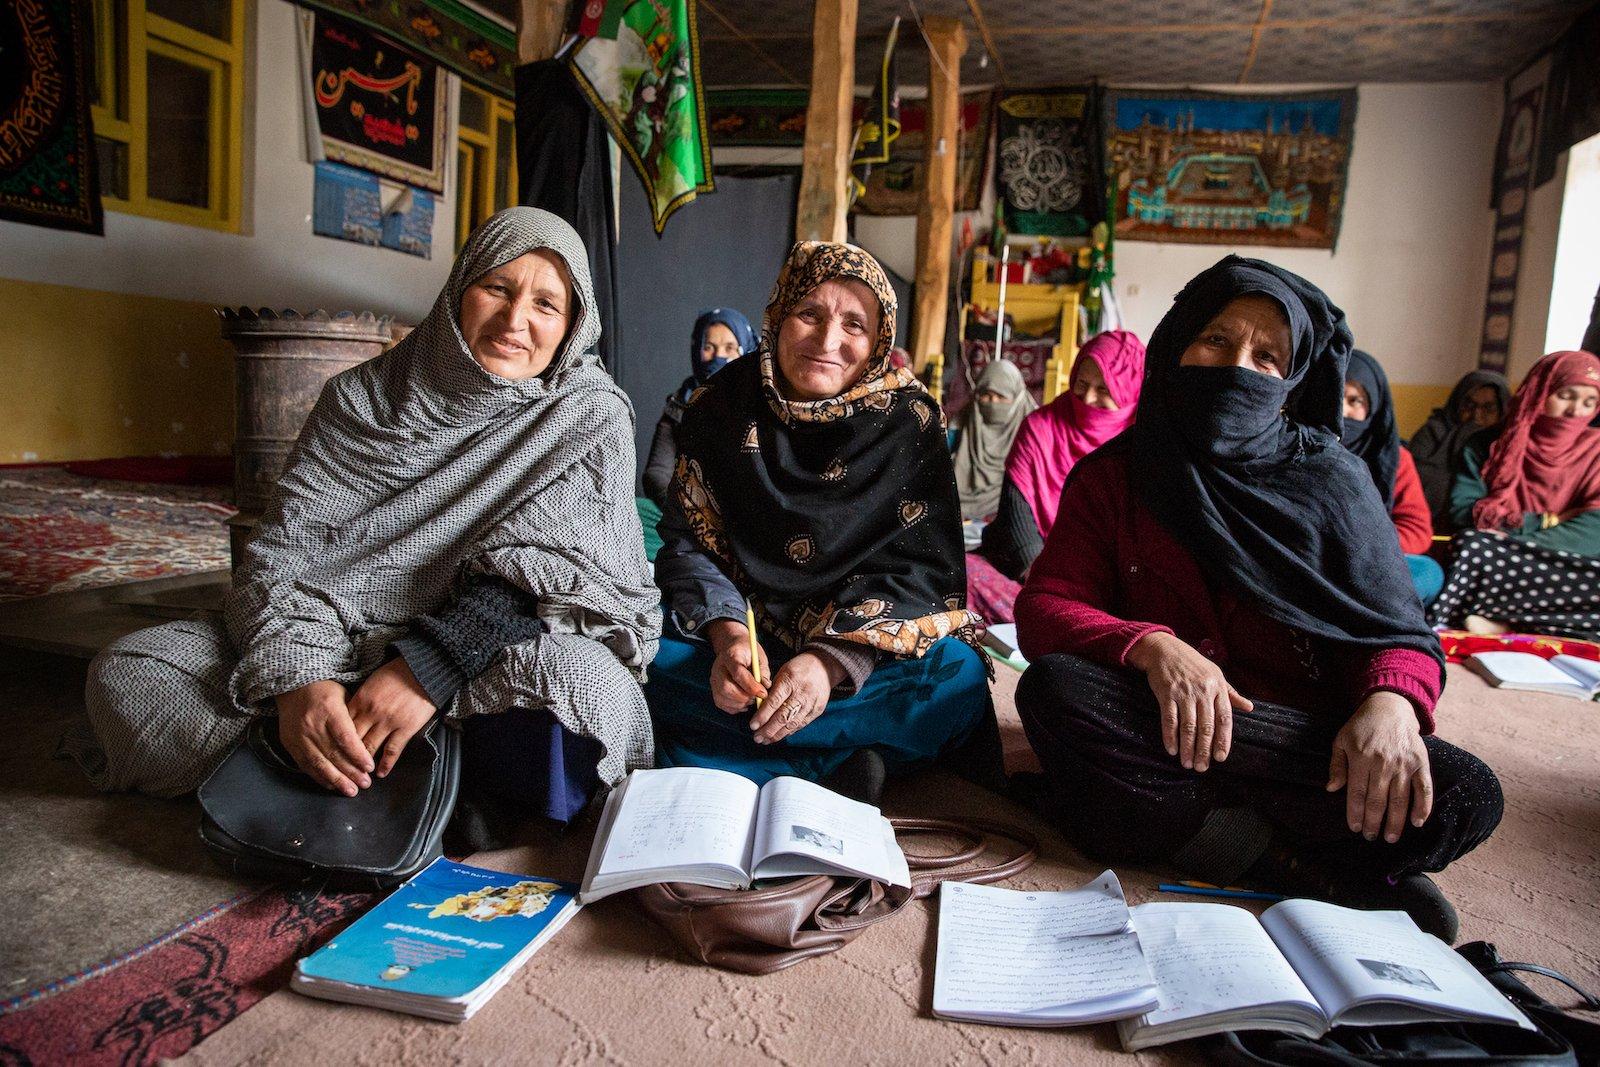 Older women studying - empowered women